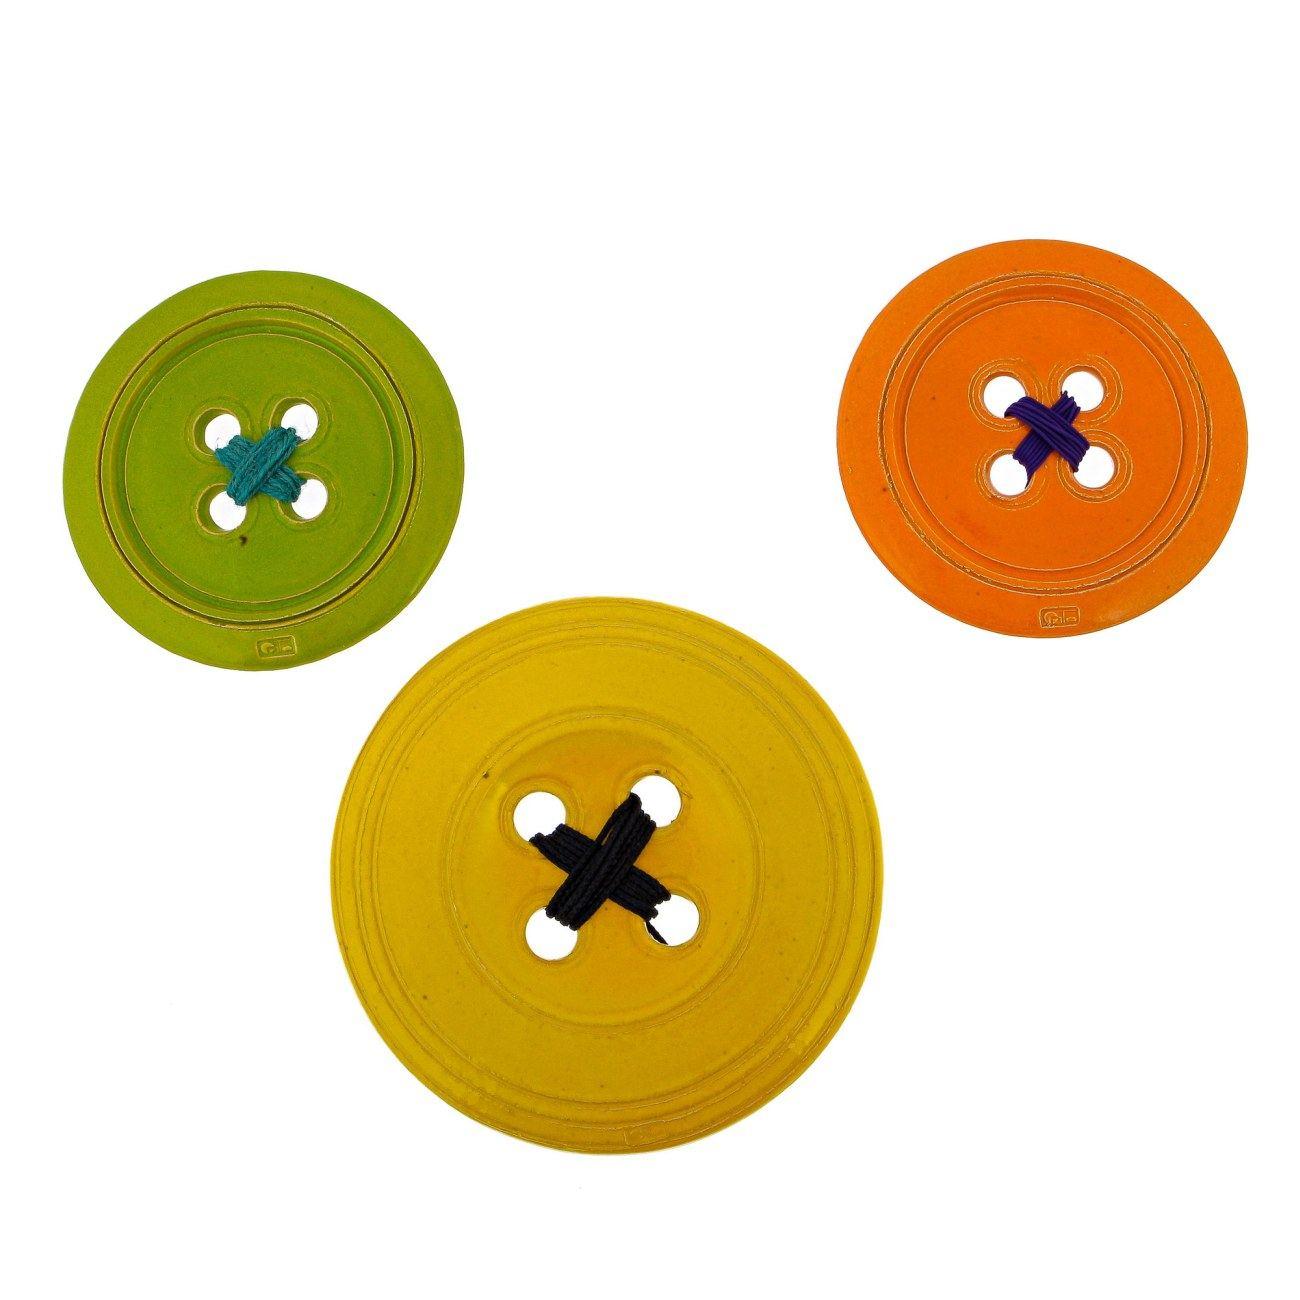 Ceramic Orange Button - Modern Handmade Wall Art Decor - Large Size ...